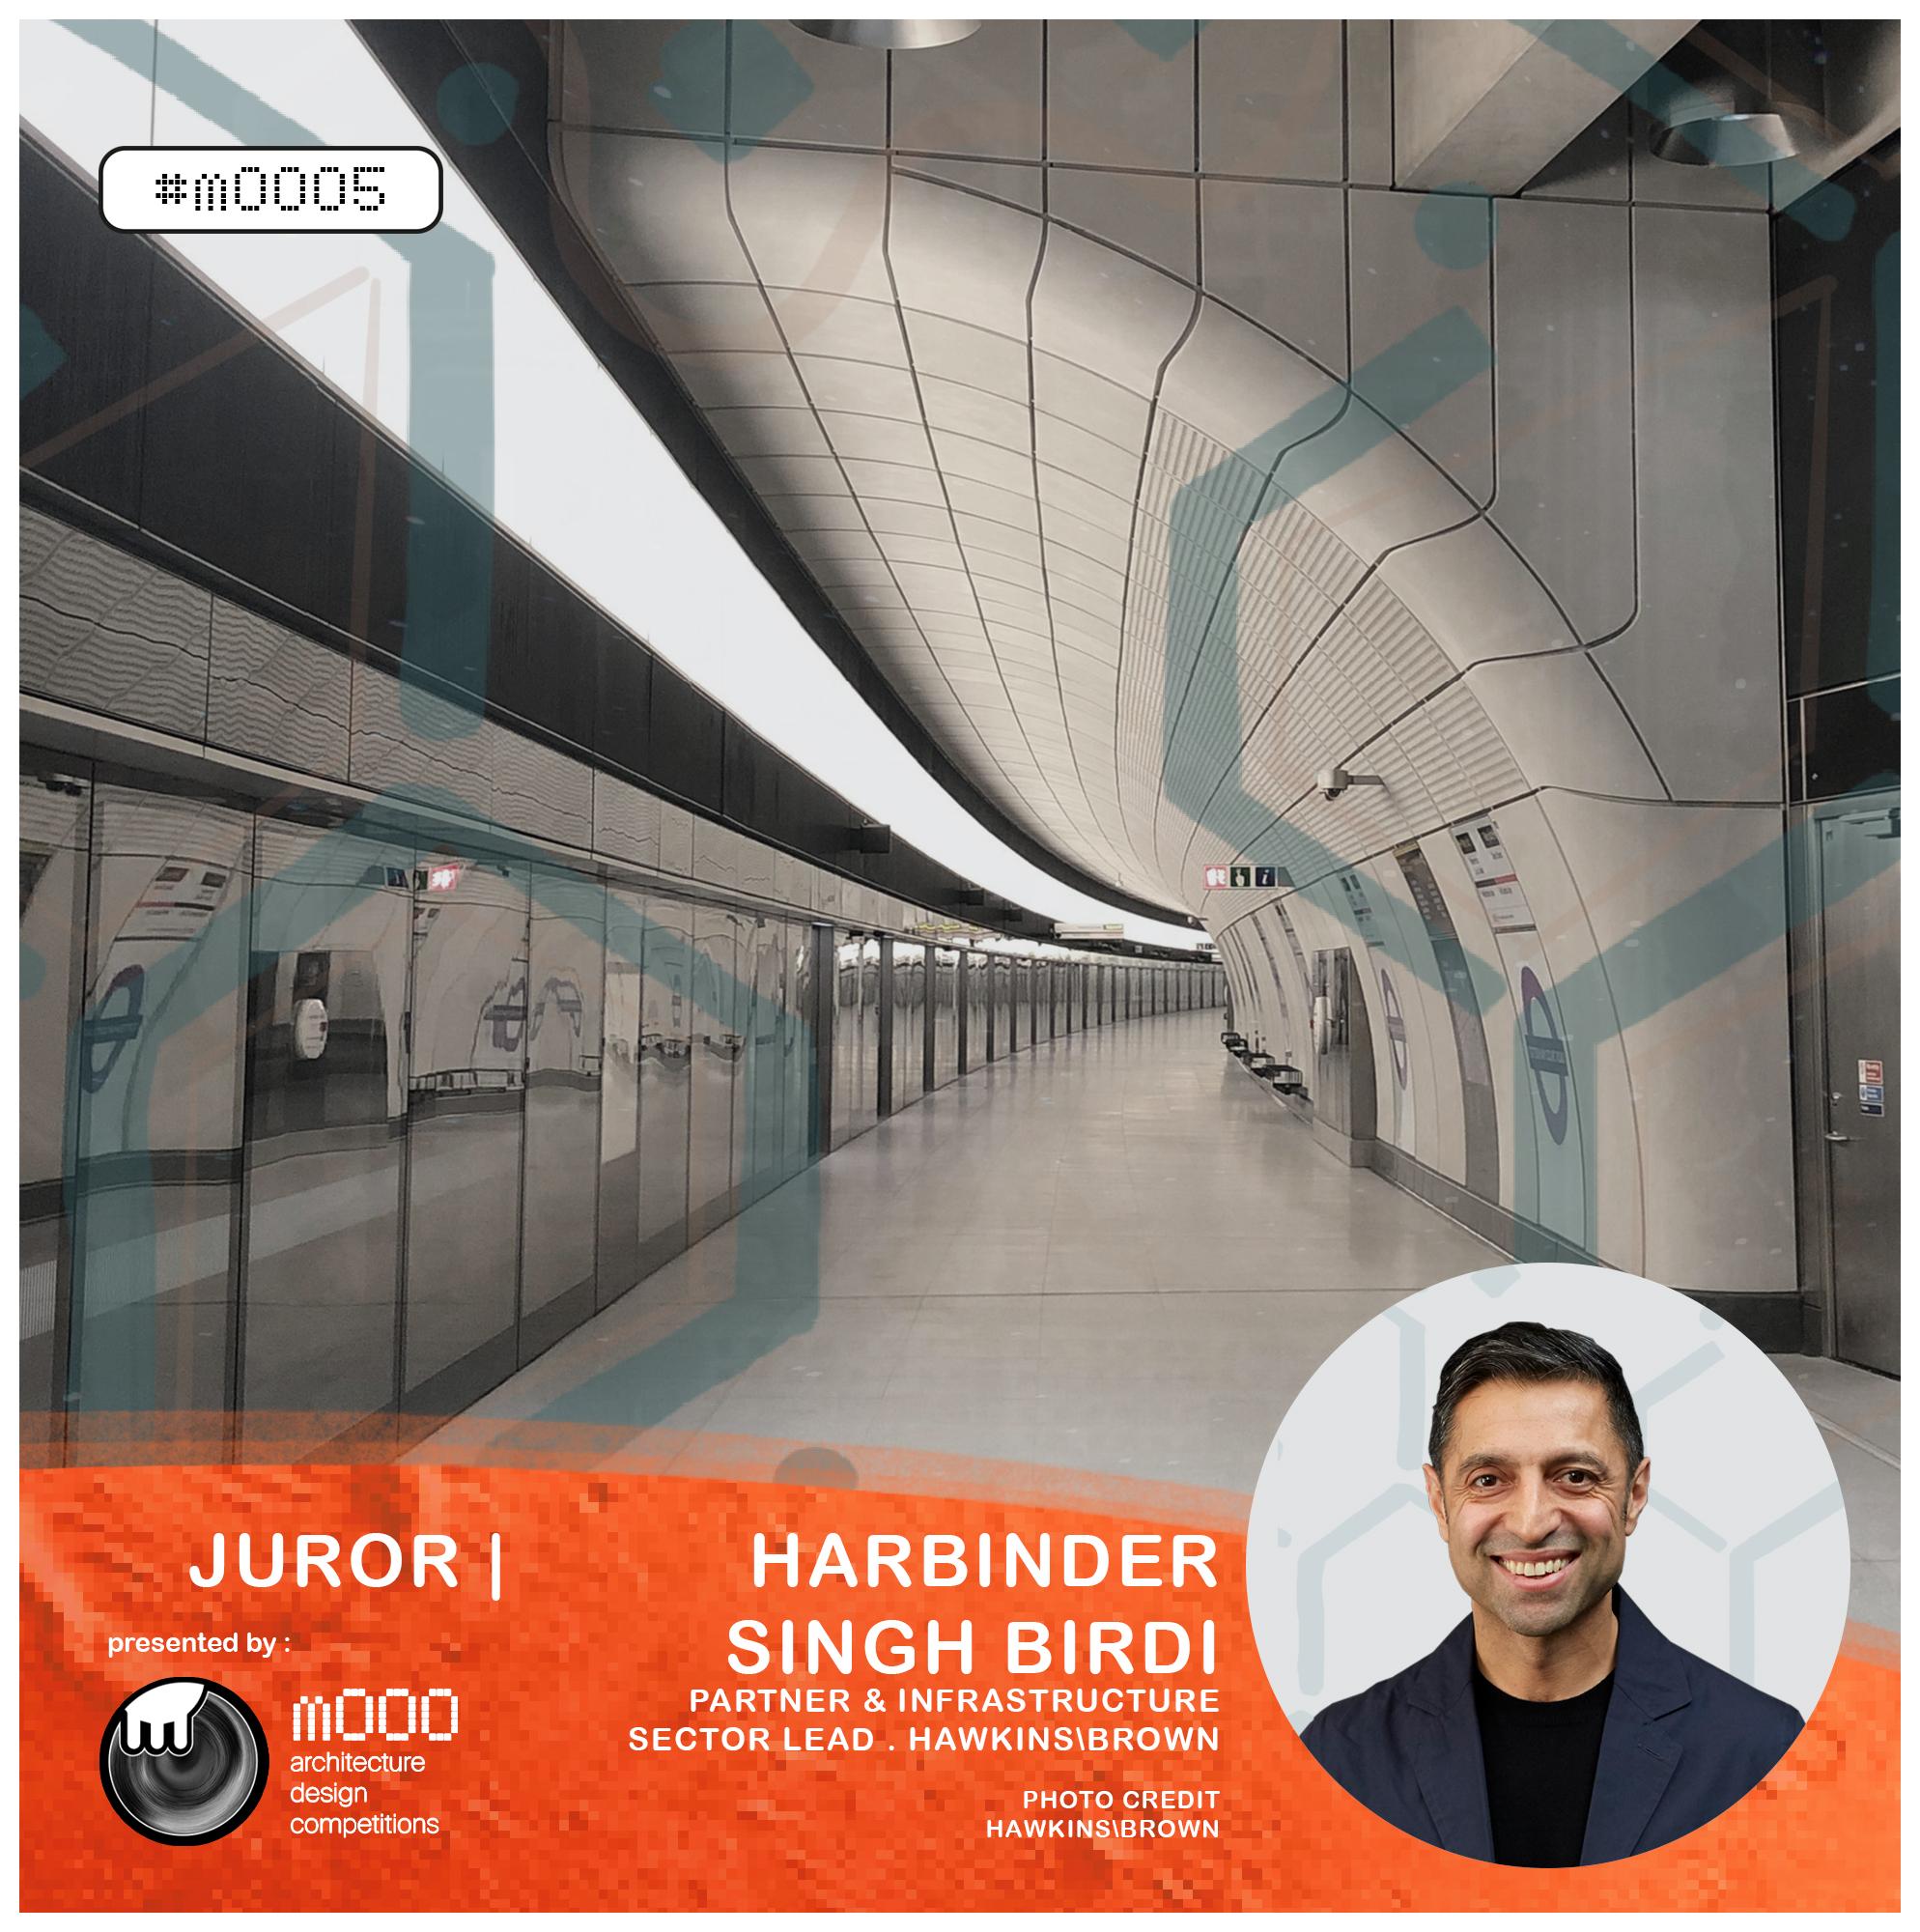 [HMM]_Human_Mission_To_Mars_1to1_JurorHarbinder2